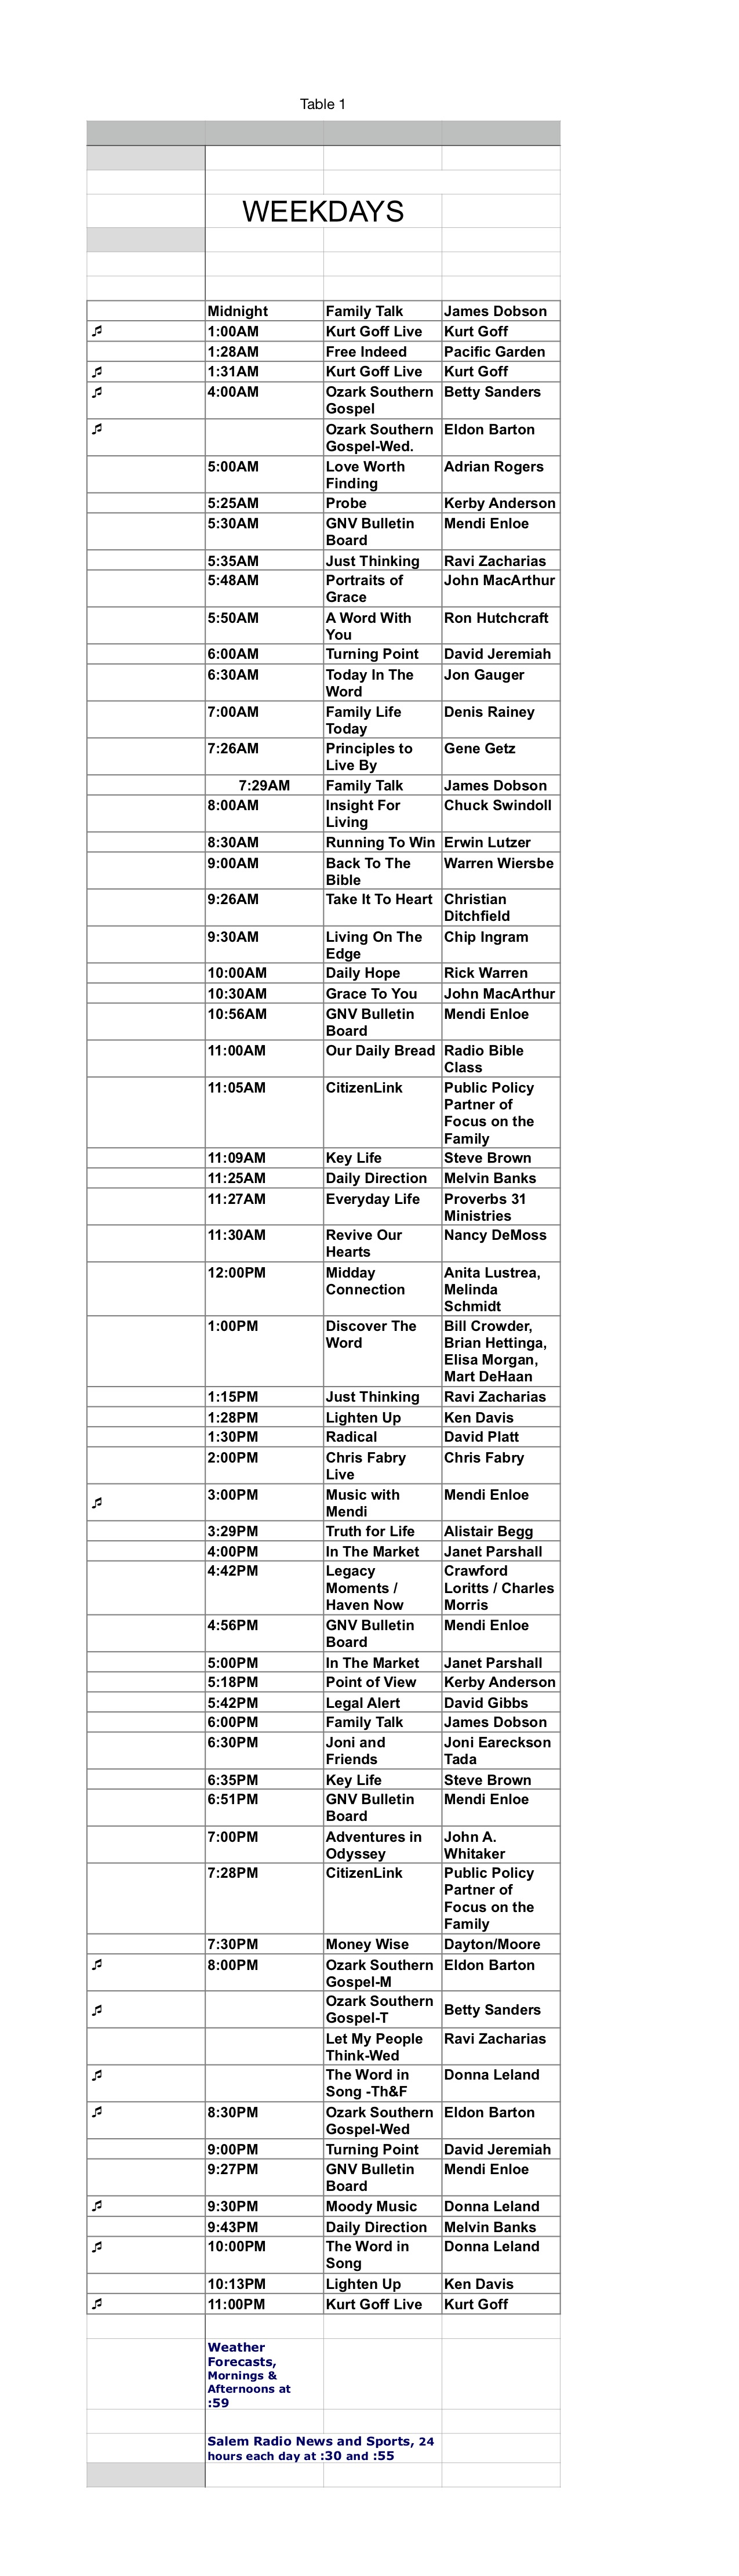 MRCB Weekday Schedule.jpg